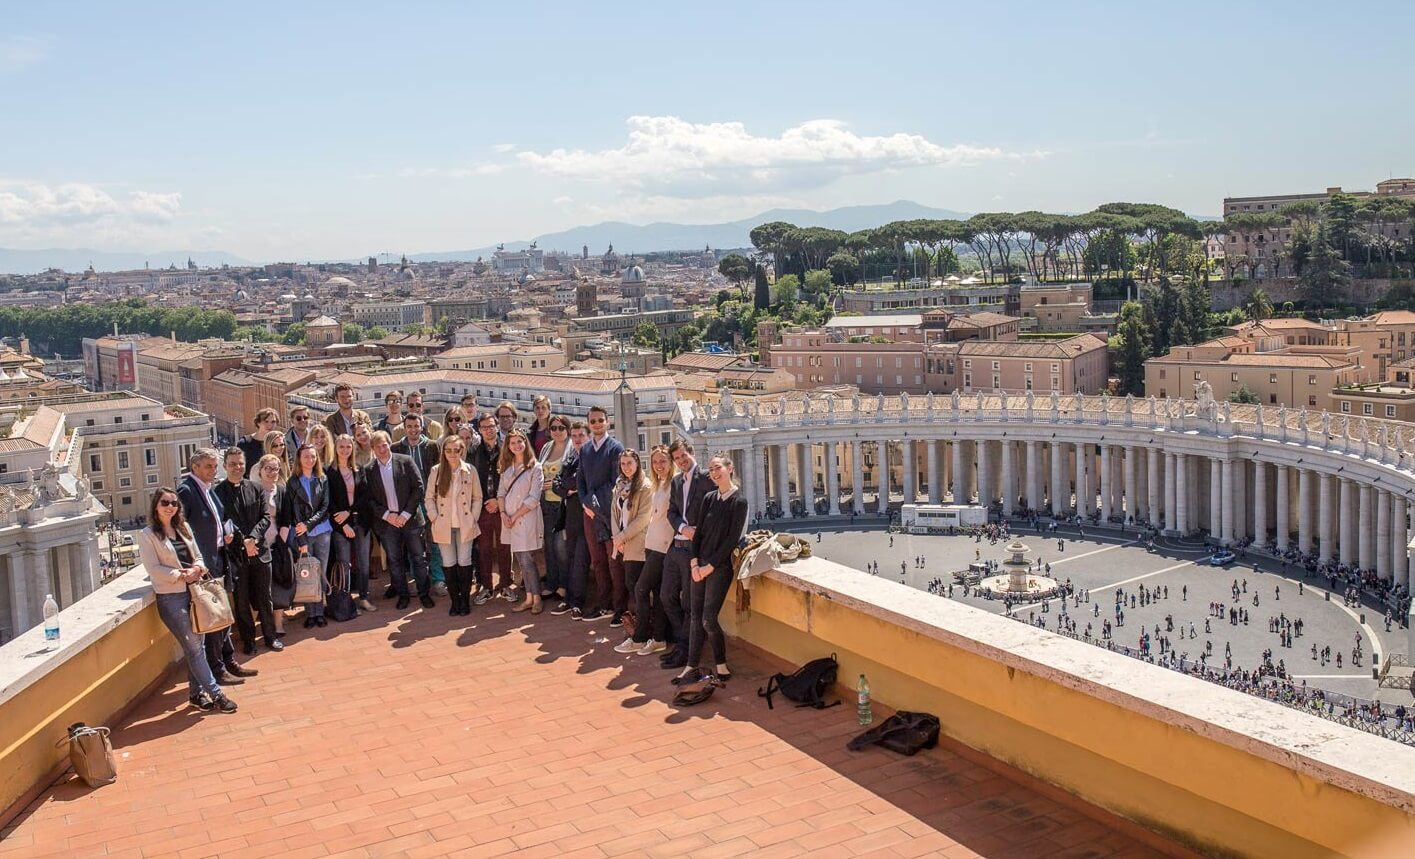 CIFE EU-Lehrgang Vatikan Rom Studienreise Balkon Petersplatz Petersdom Gruppe StudentInnen Wien Figlhaus Wien